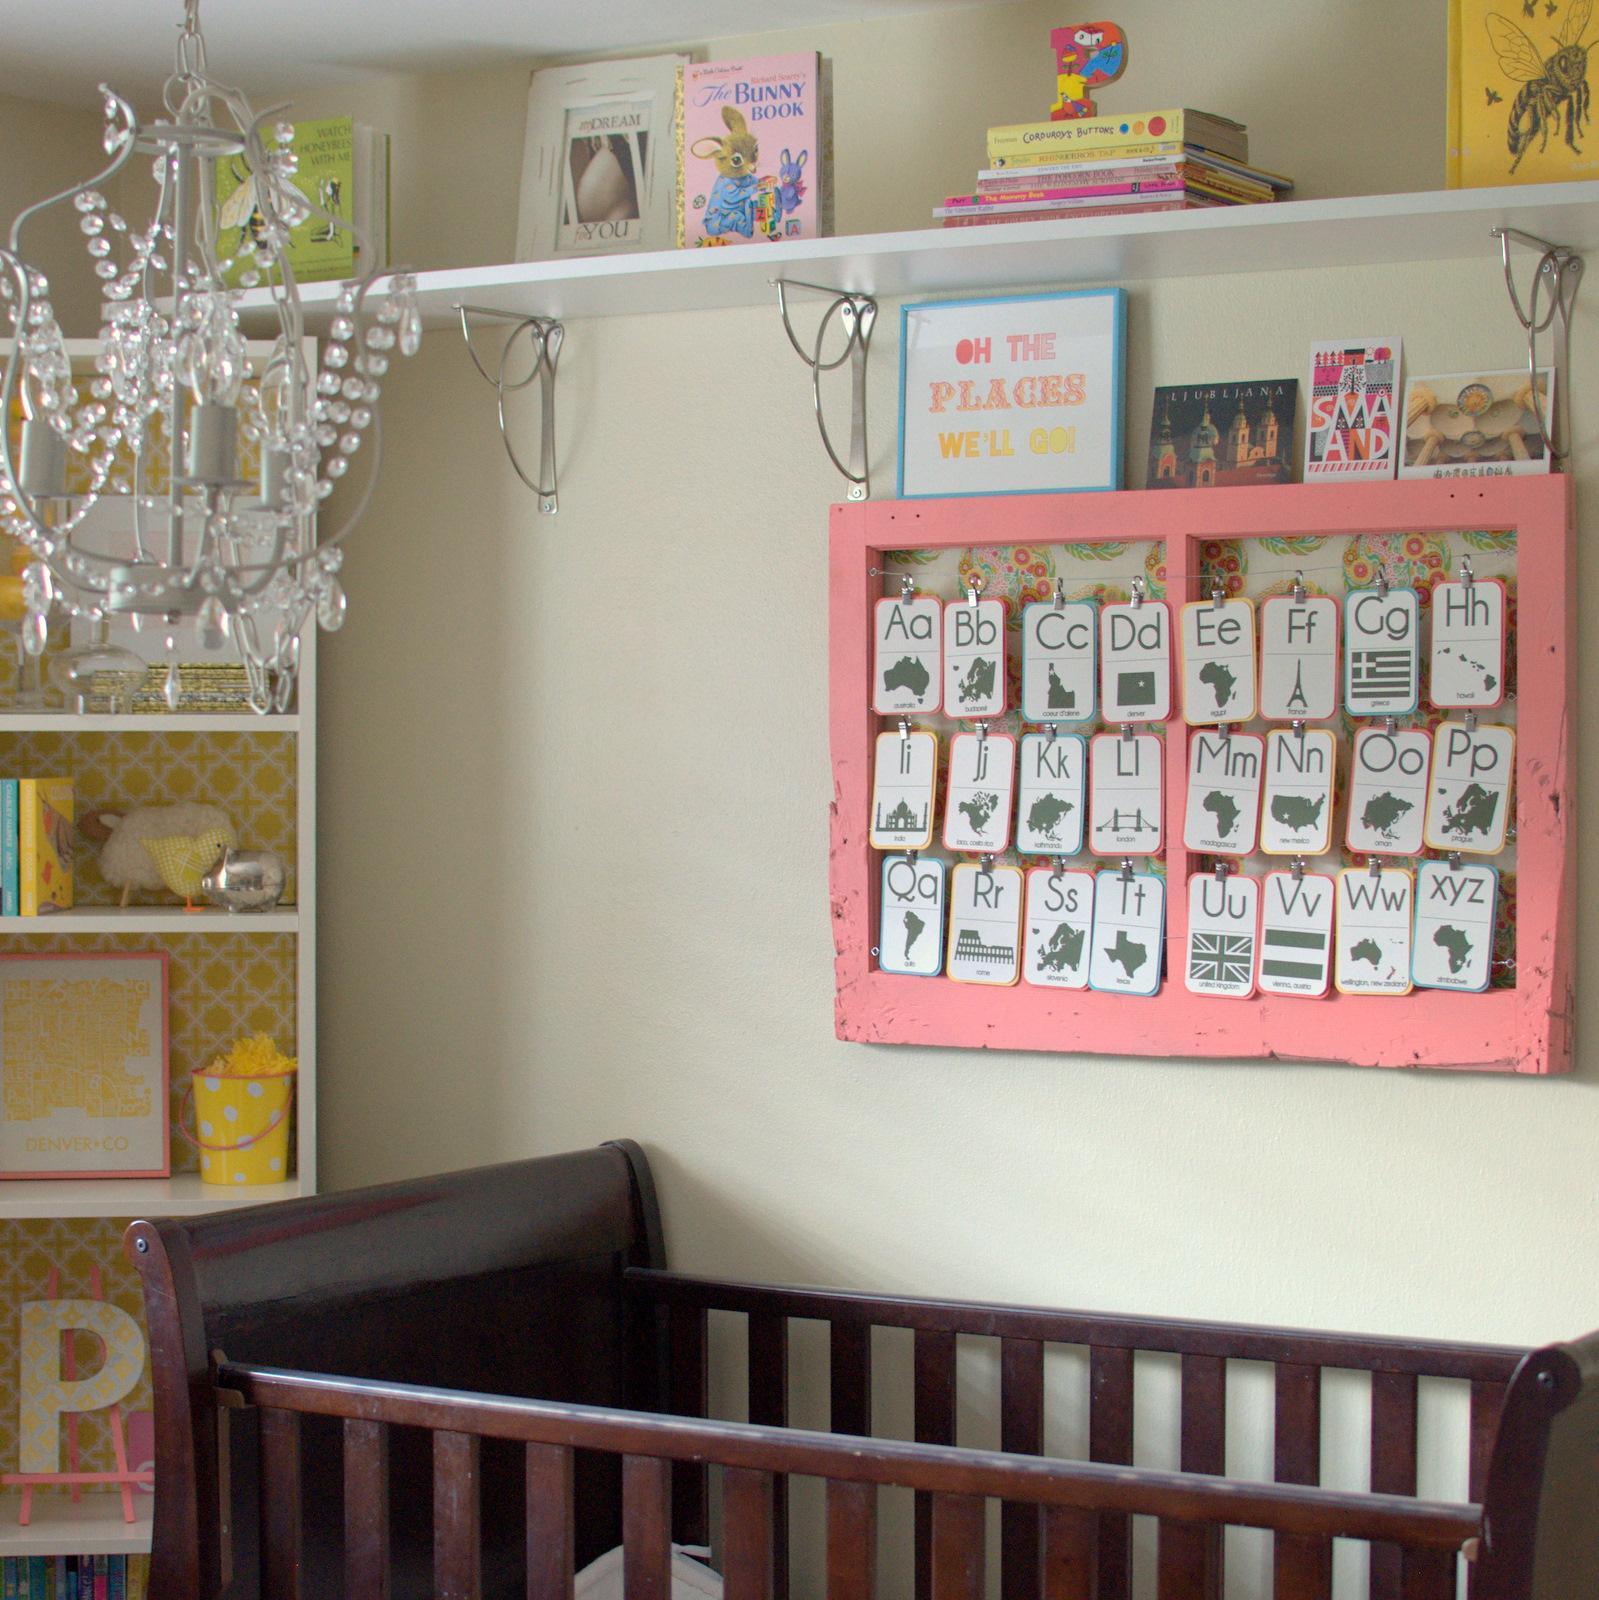 Nursery Decorating Ideas: DIY Nursery Decor Ideas